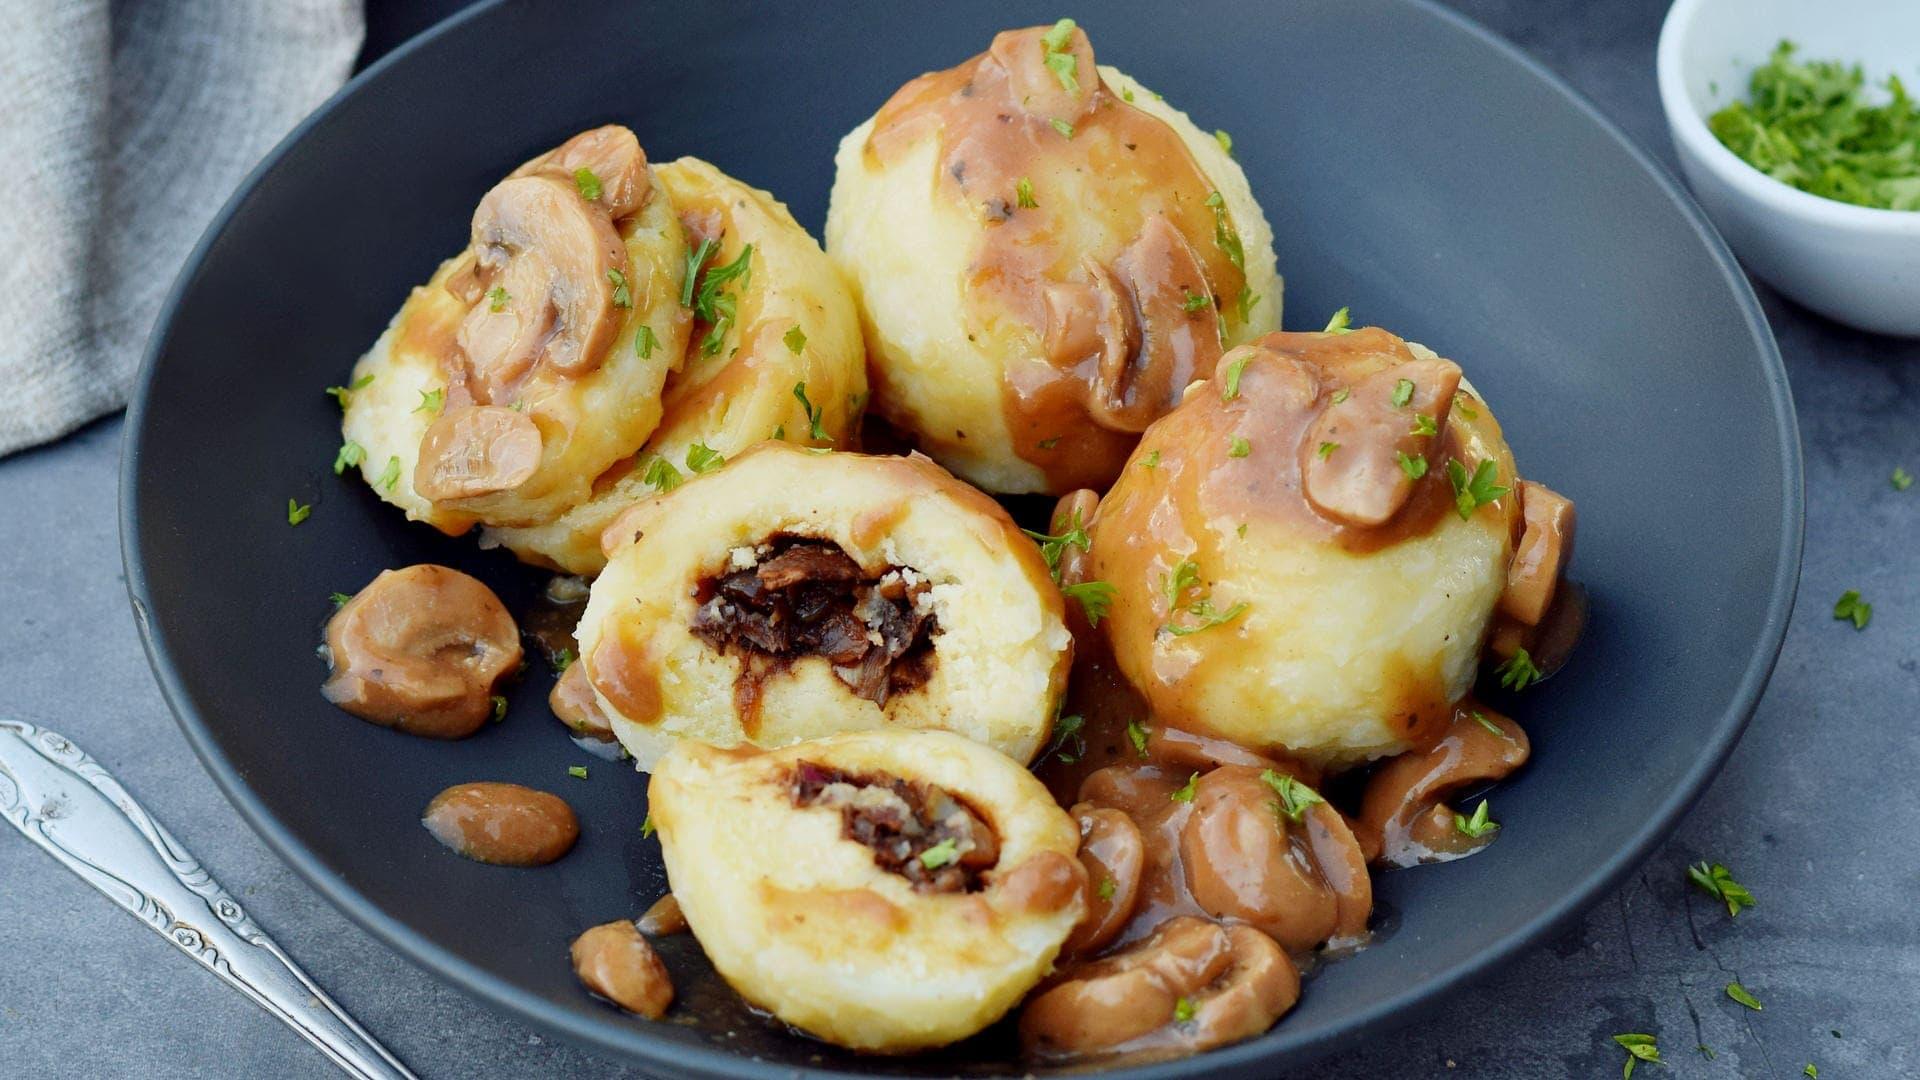 horizontal photo of stuffed potato dumplings with mushroom gravy